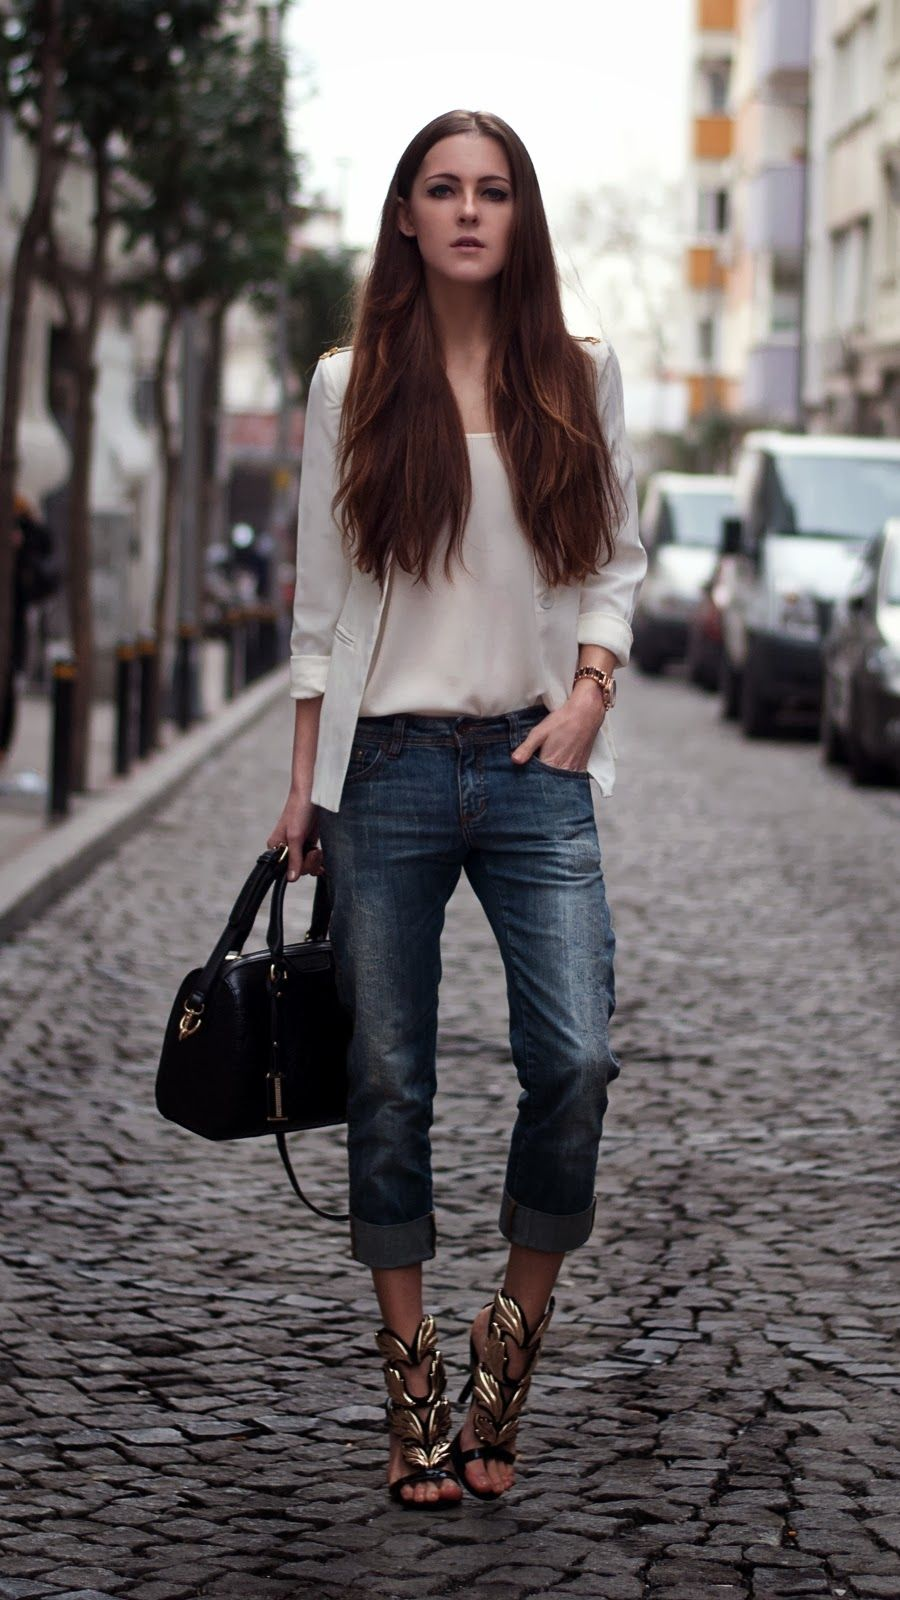 #metallic sandals #high heel #jeans #street style